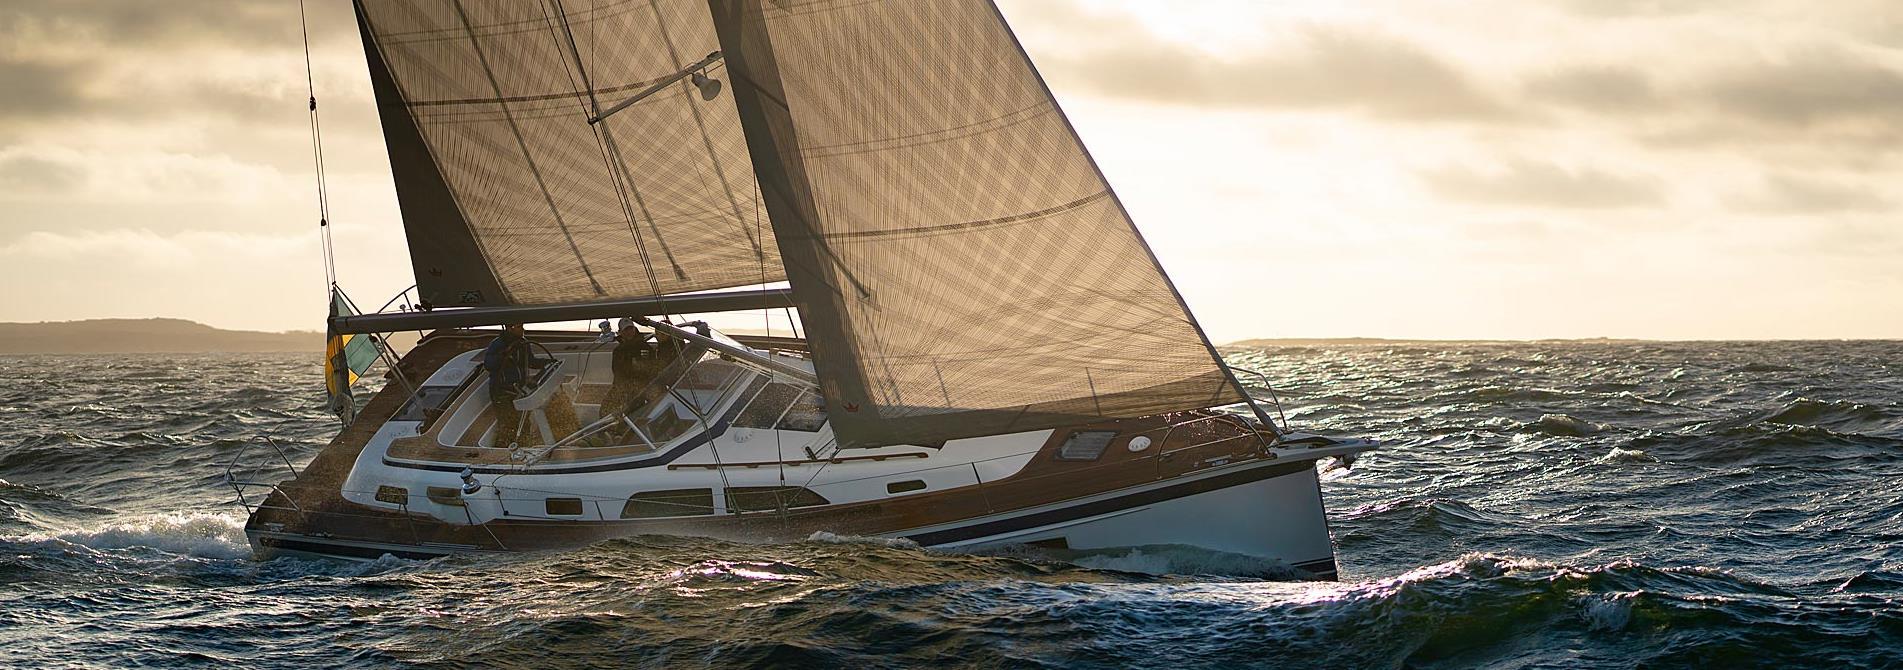 Sailing photos of the all-new Hallberg-Rassy 40C